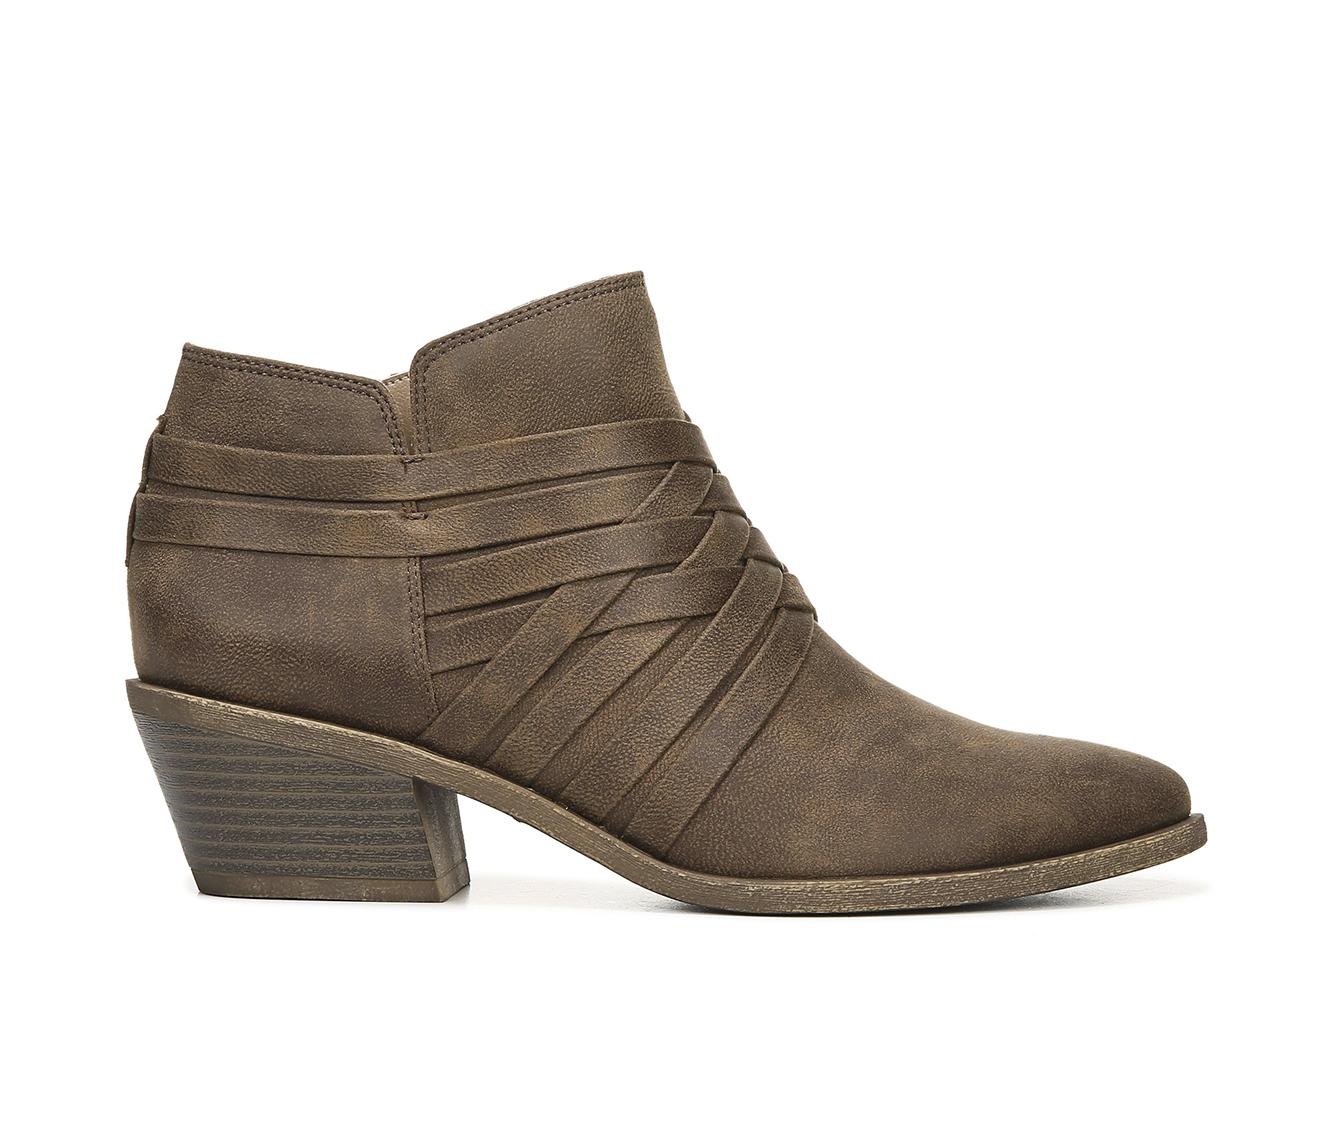 LifeStride Prairie Women's Boots (Brown - Faux Leather)